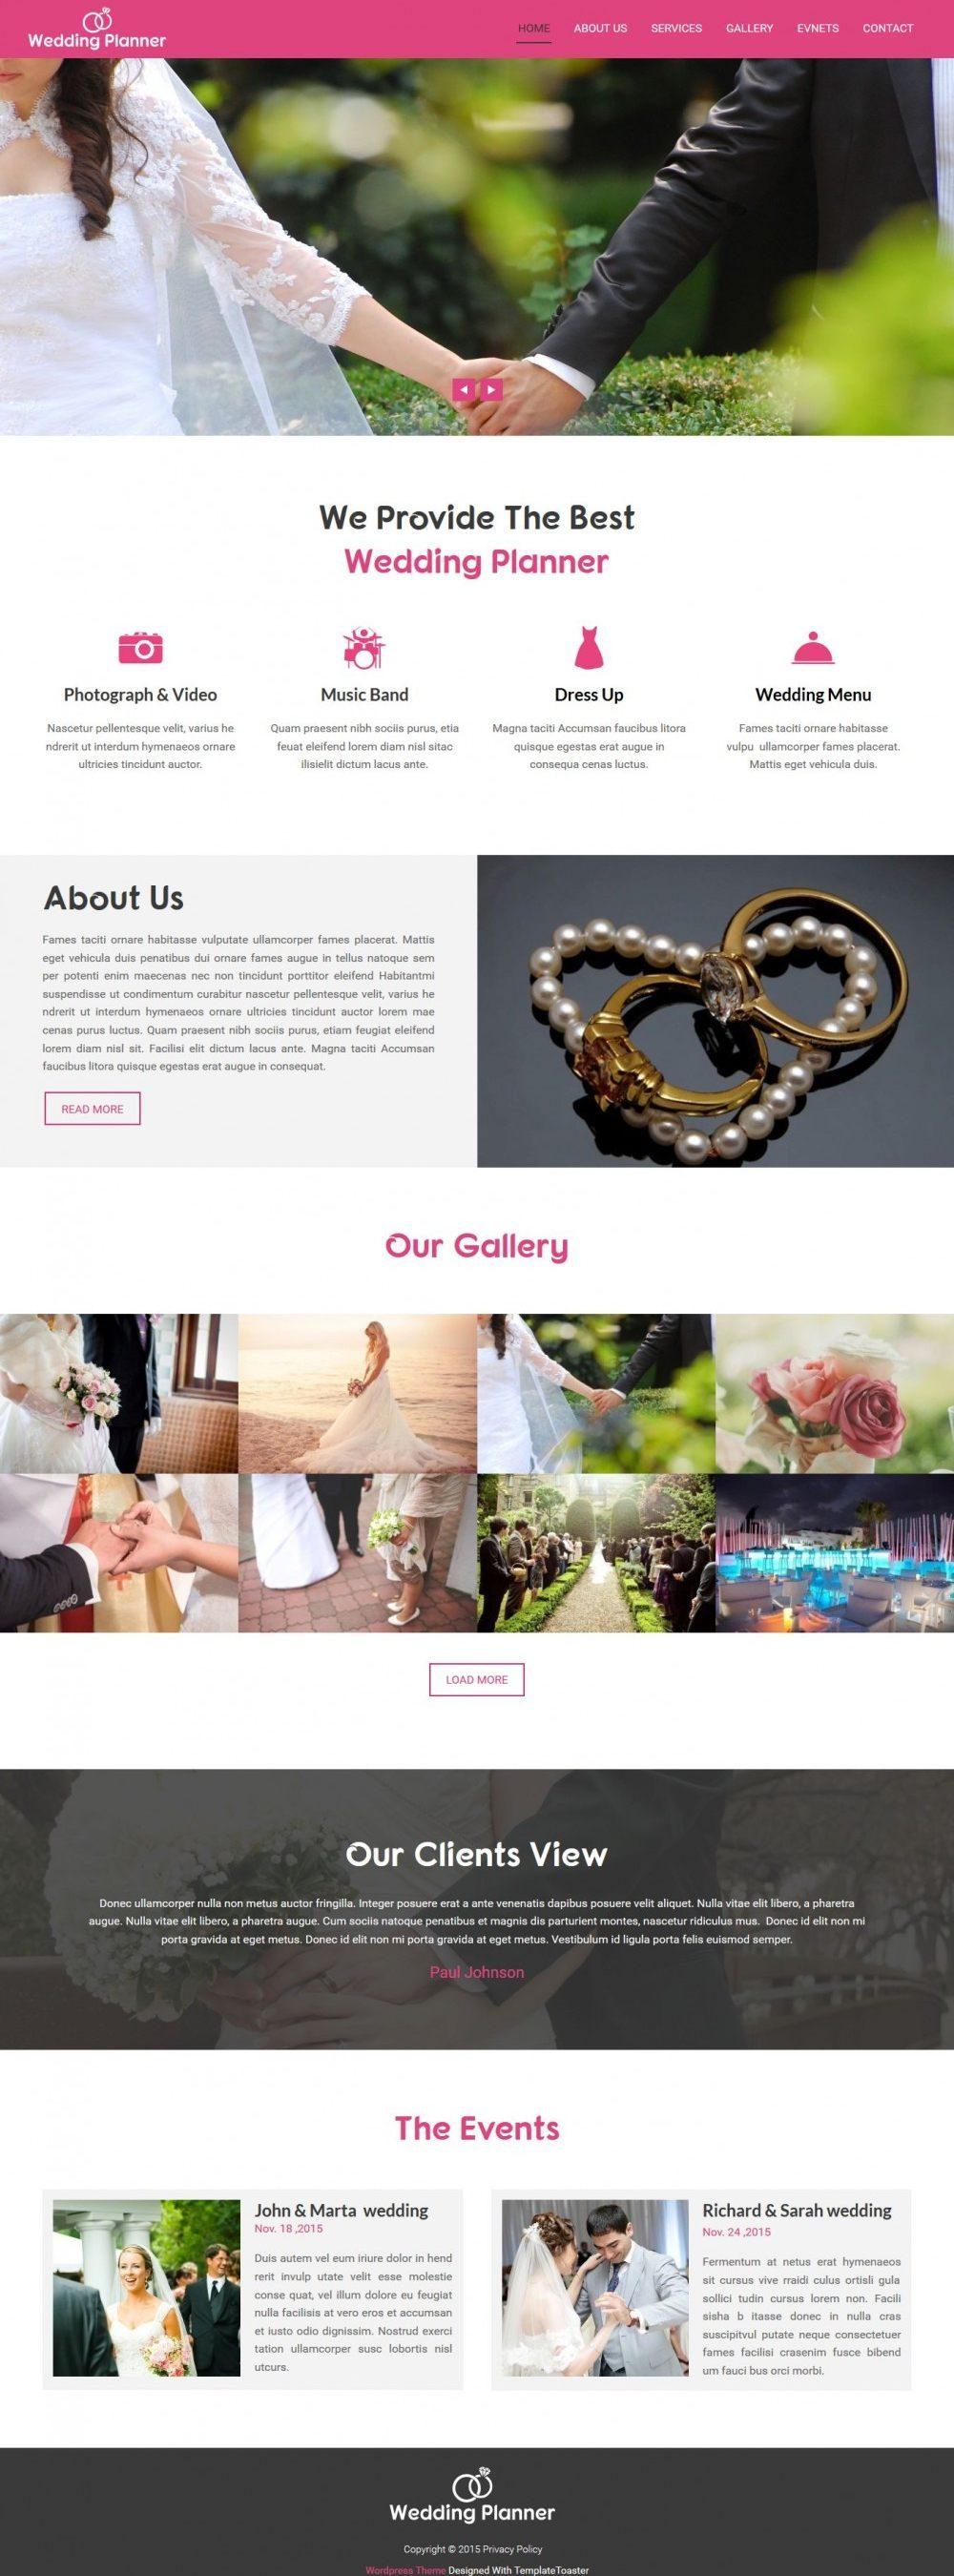 Wedding Planner - Wedding Planner And Wedding Organizer Free Wordpress Theme